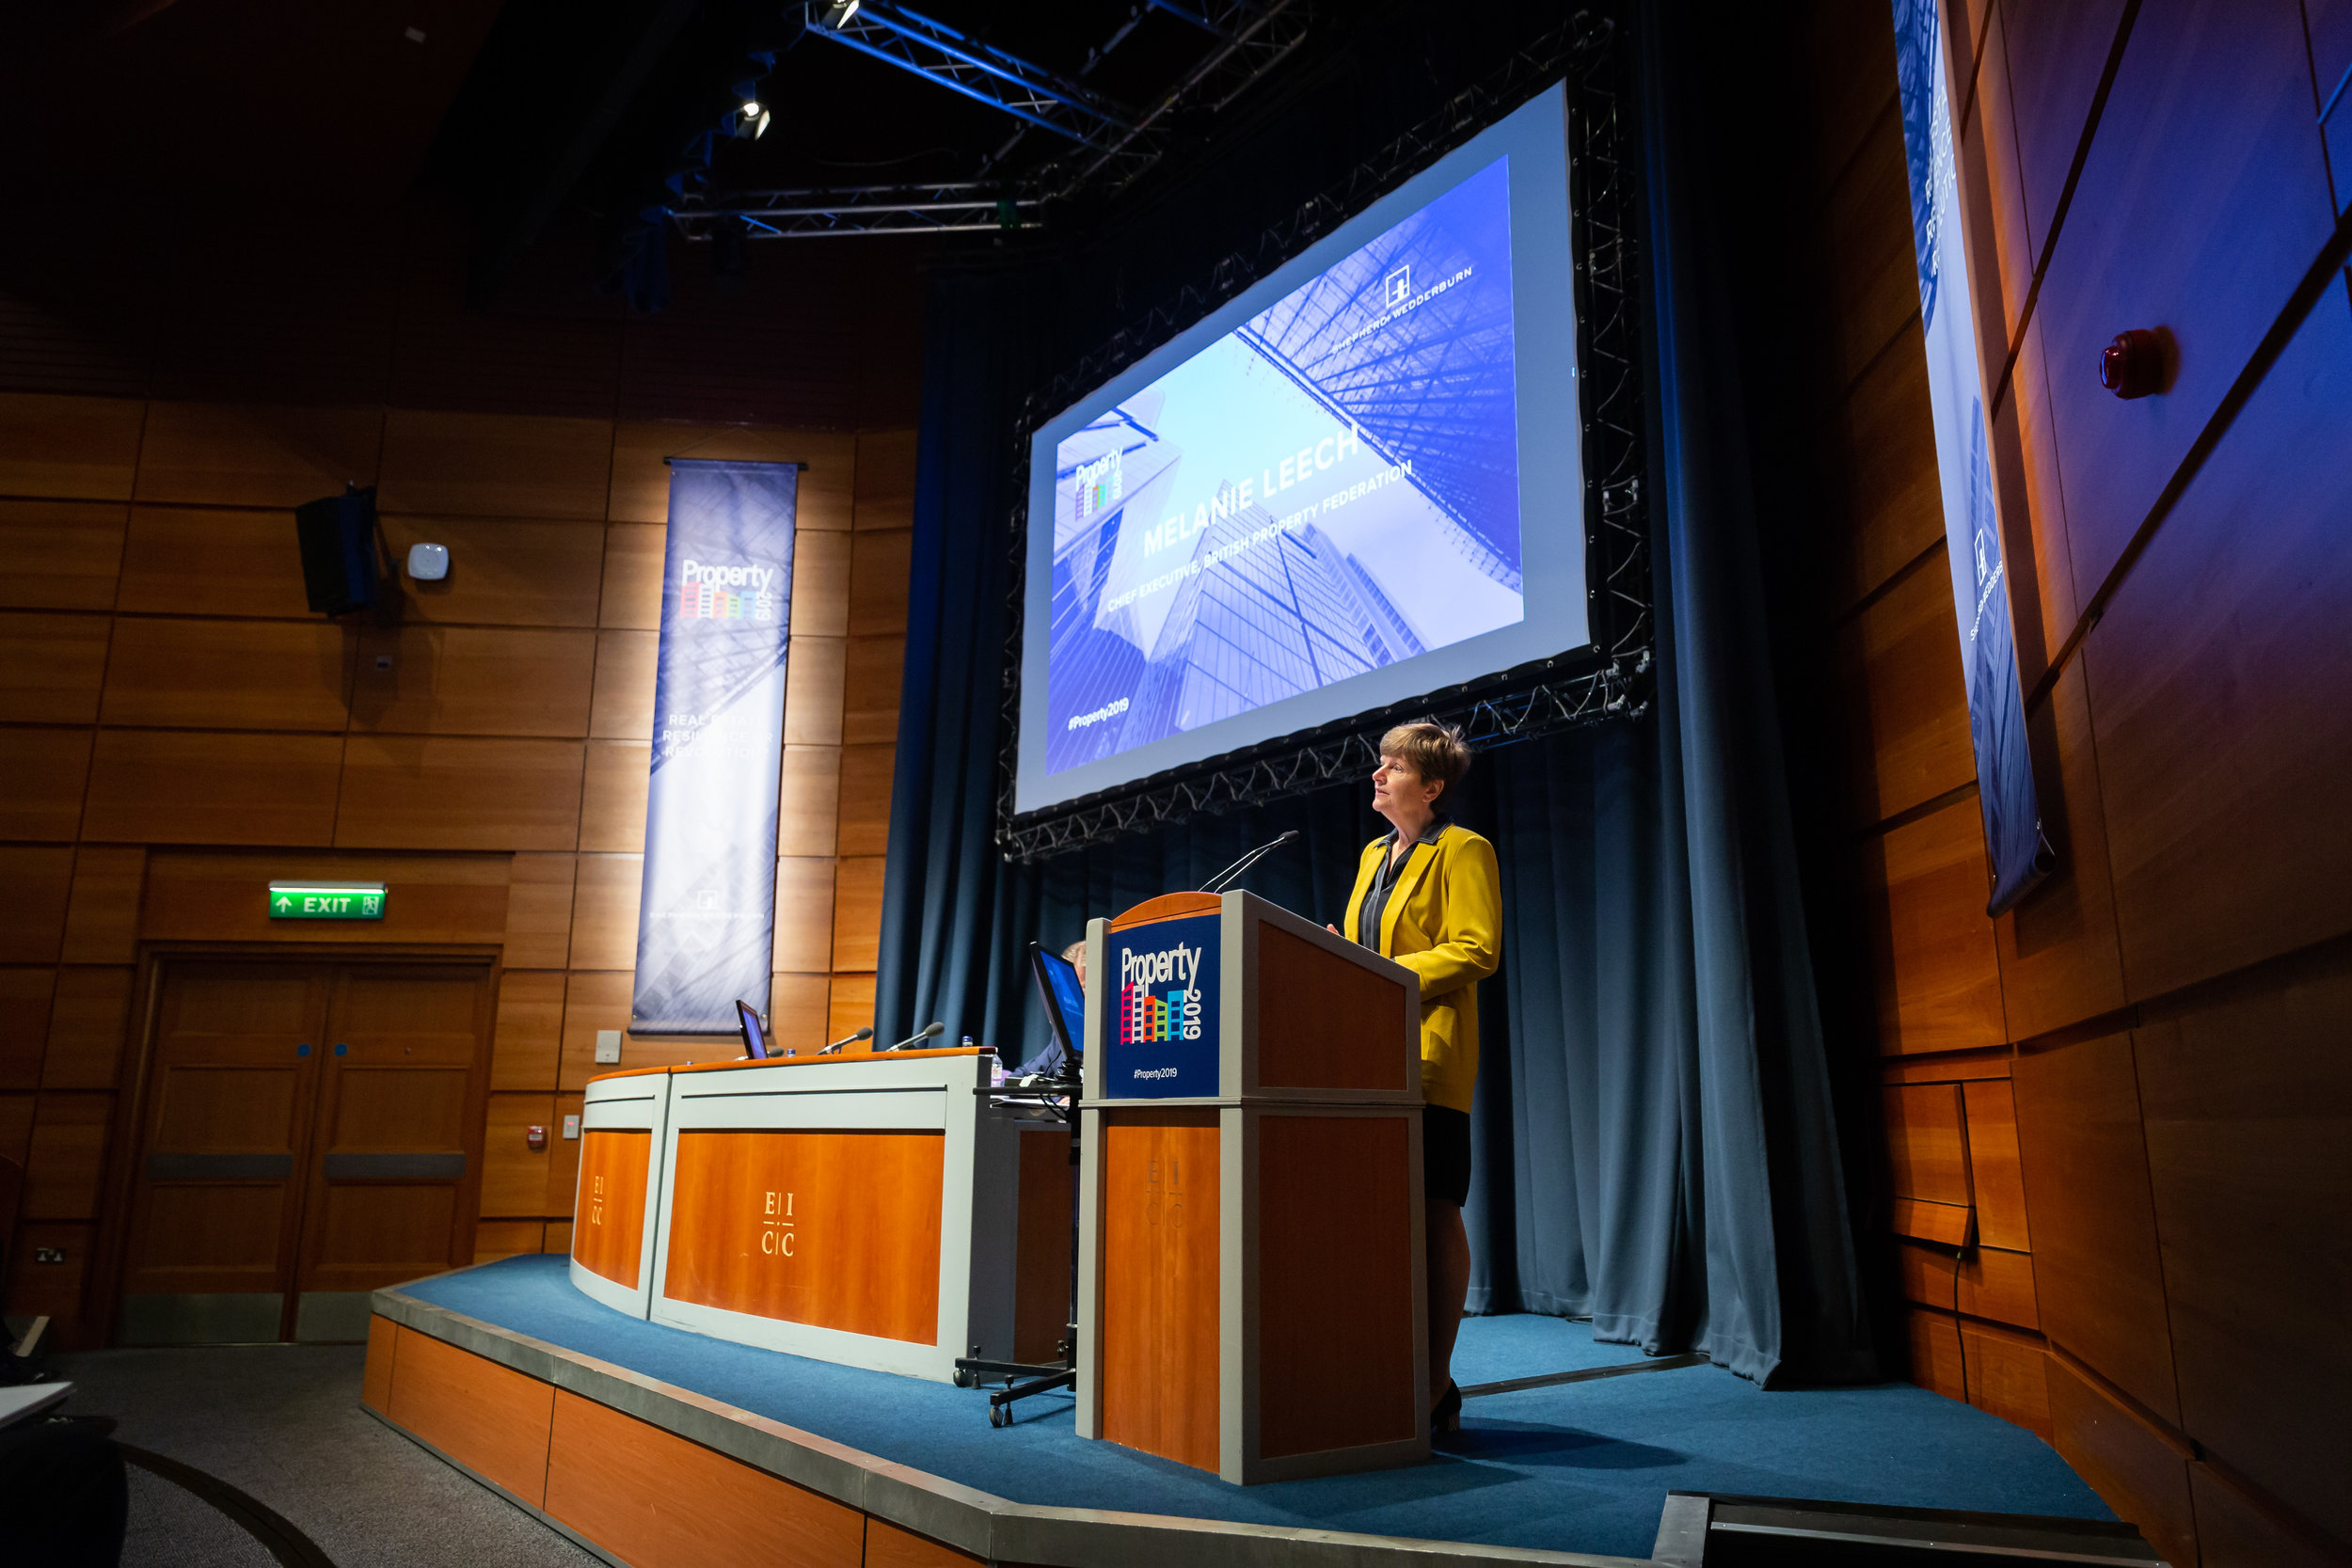 ShepherdandWedderburnPropertyConference2019-38.jpg